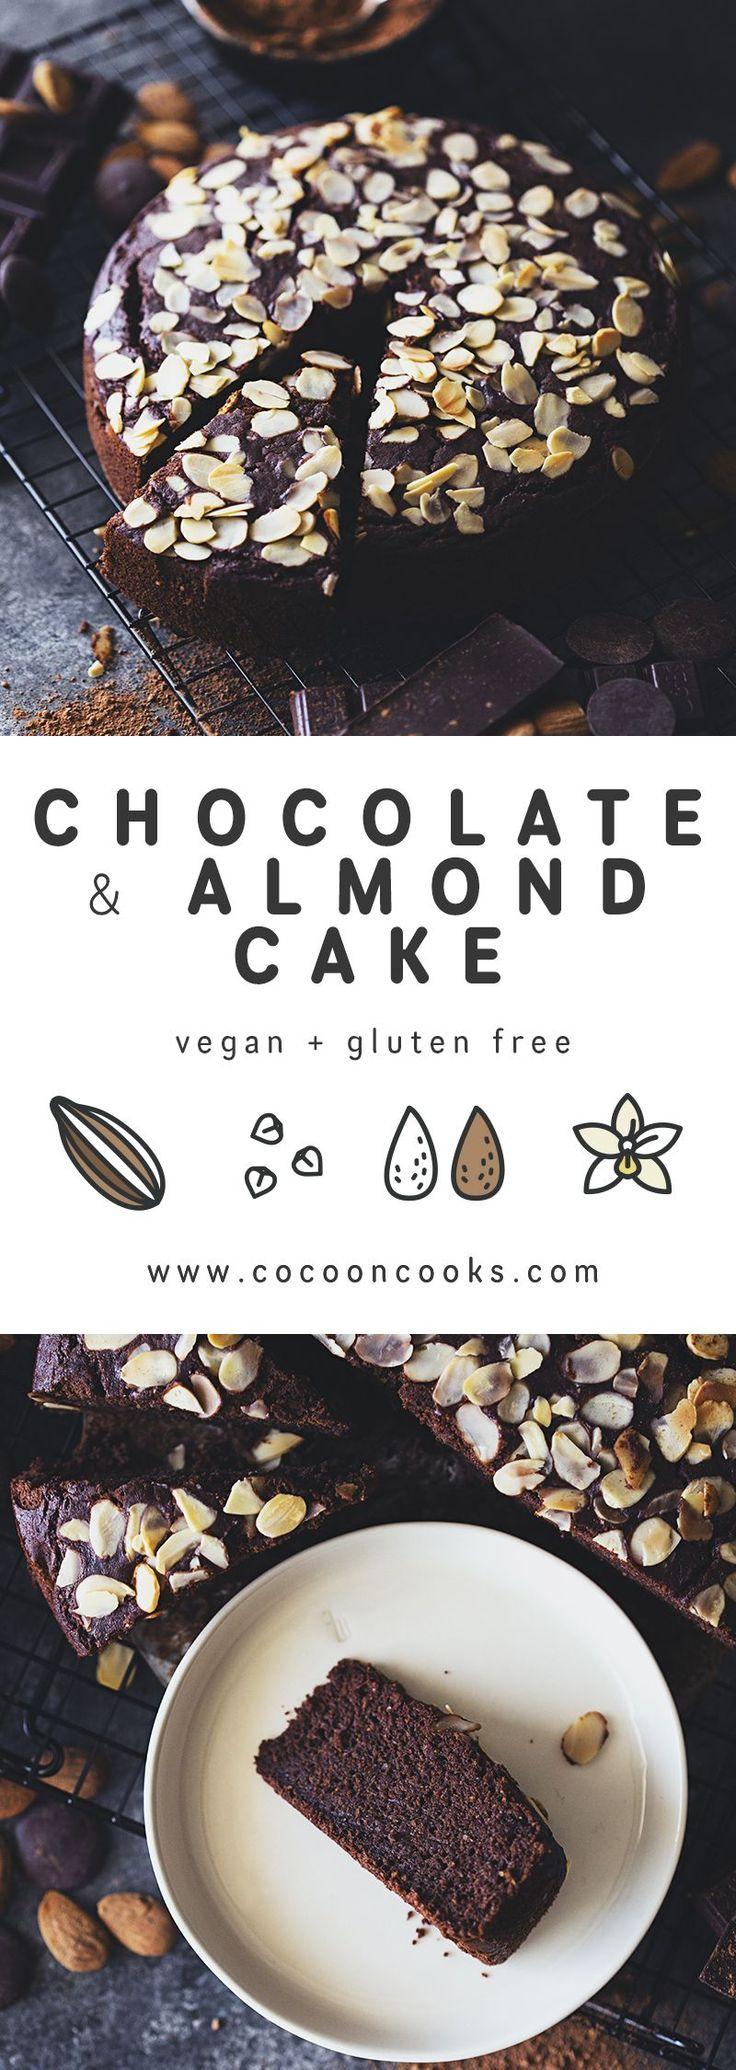 Chocolate almendras cake